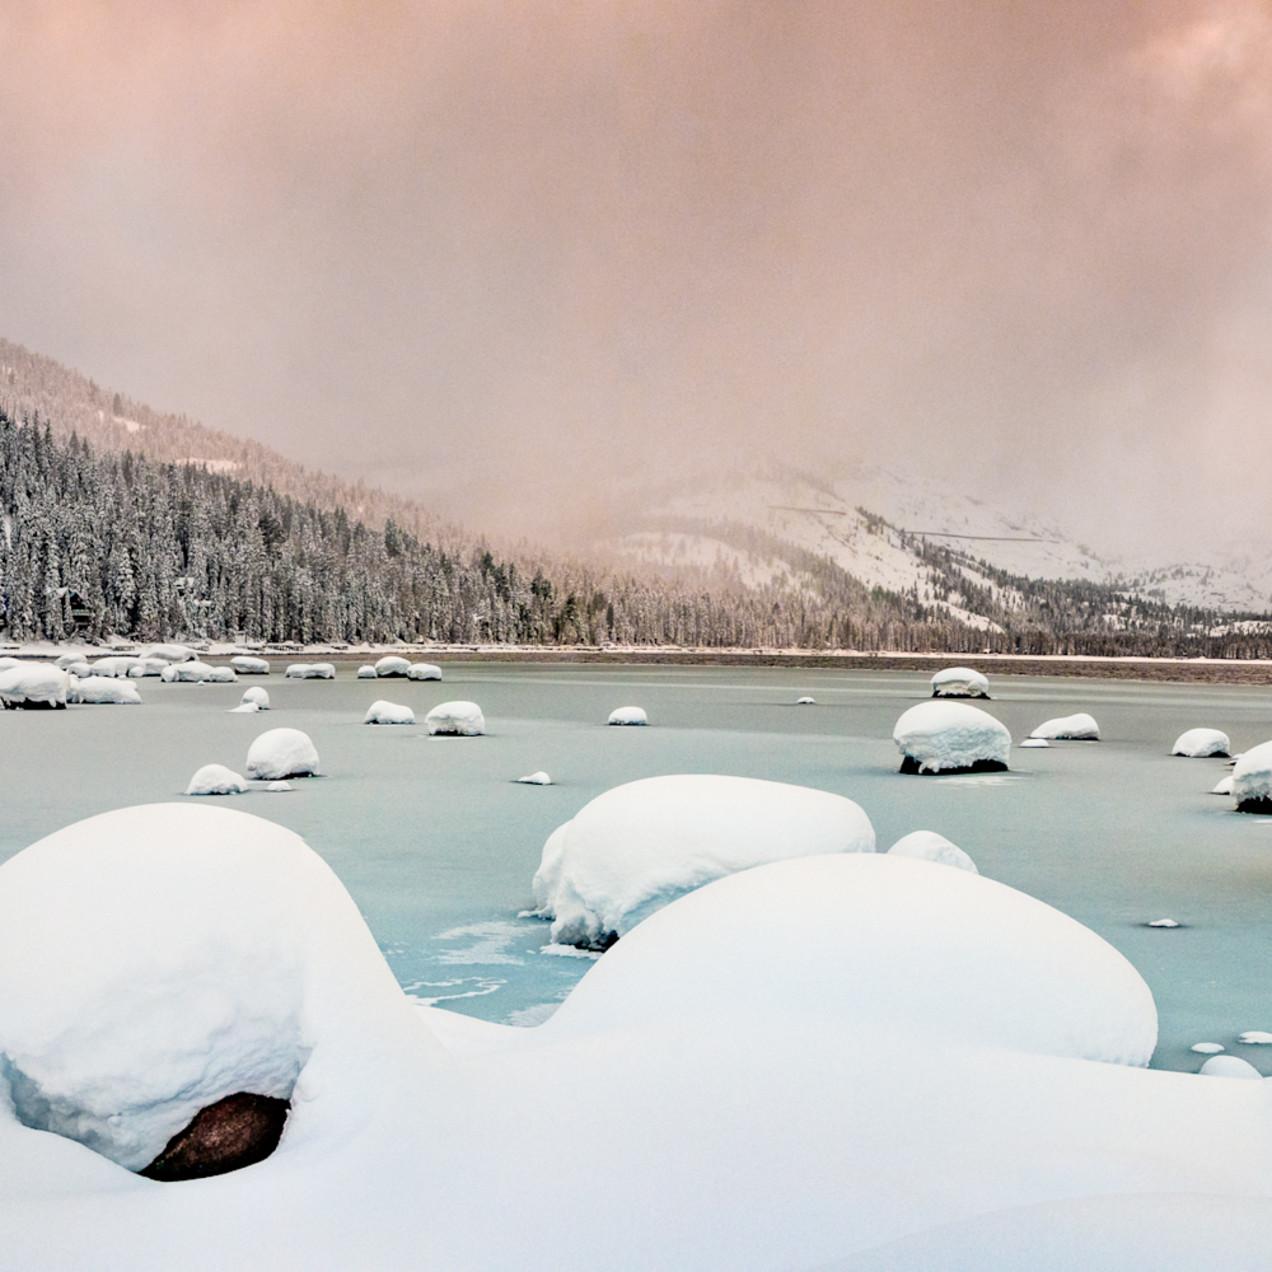 Winter storm donner lake 2 e9nyaw